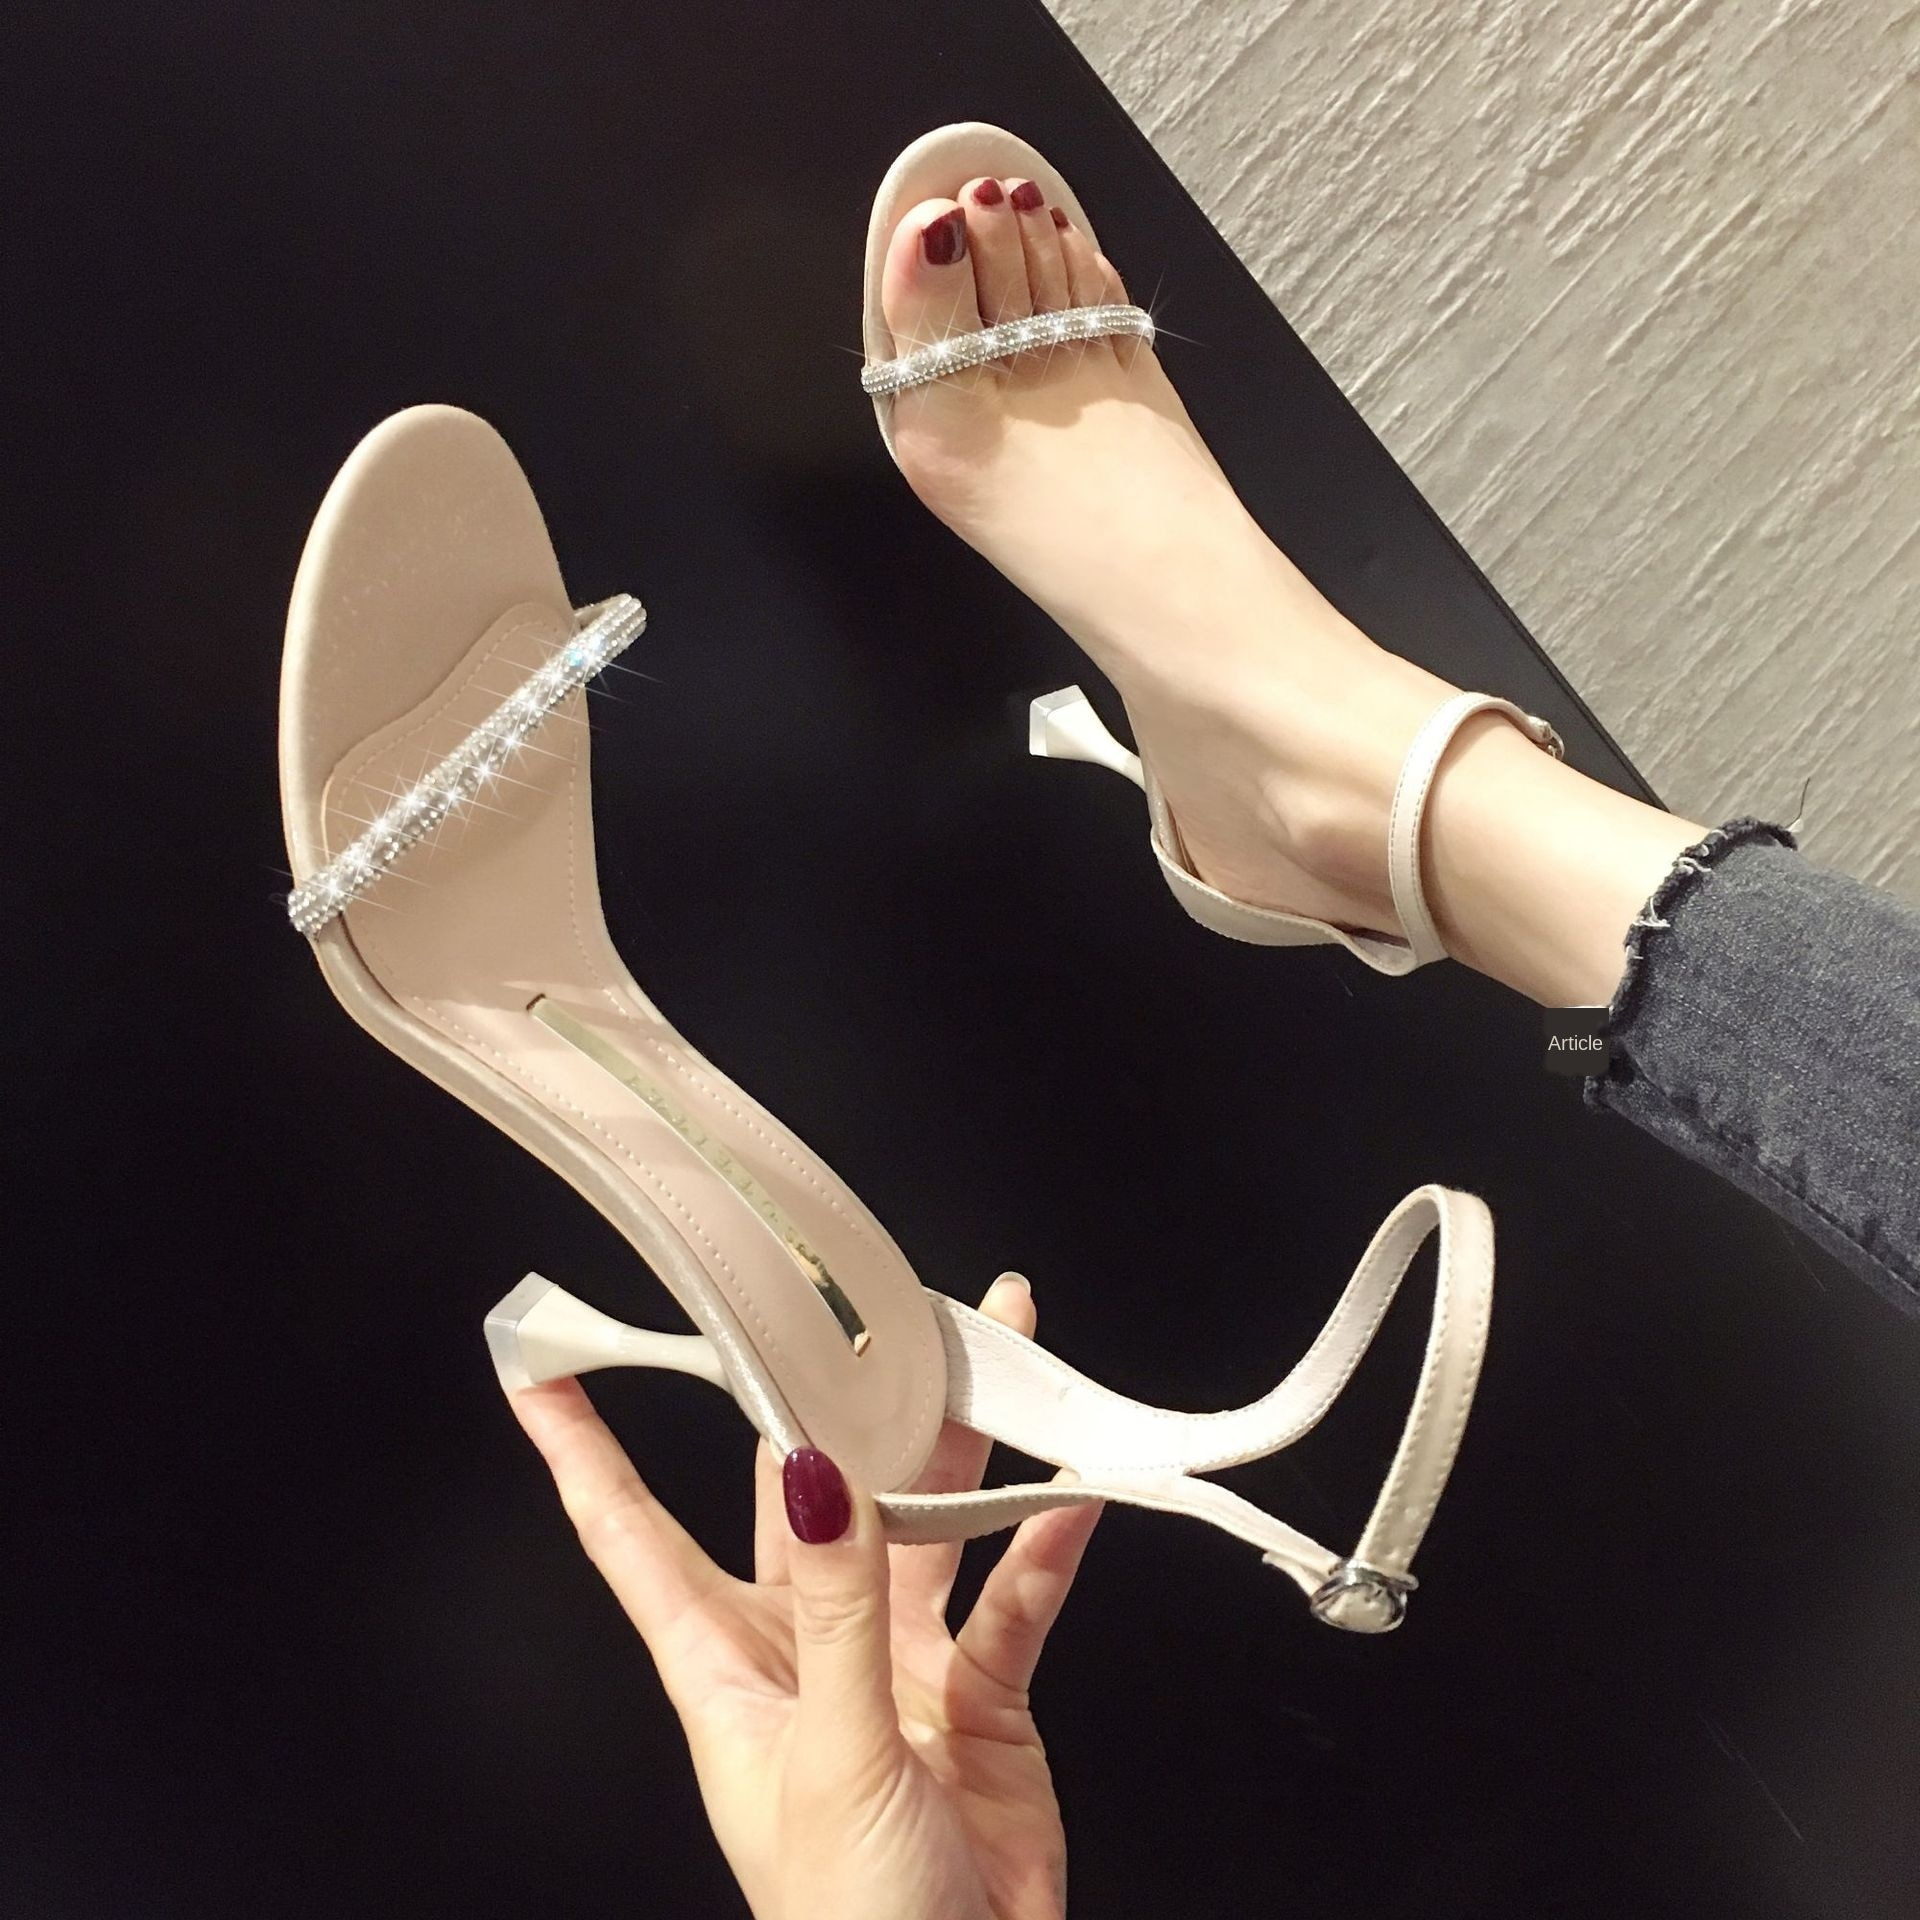 Zapatos de tacón alto de cabeza redonda de verano 2020 con diamantes de imitación venta directa de fabricante sandalias de una sola Correa antideslizantes de talón Delgado lista